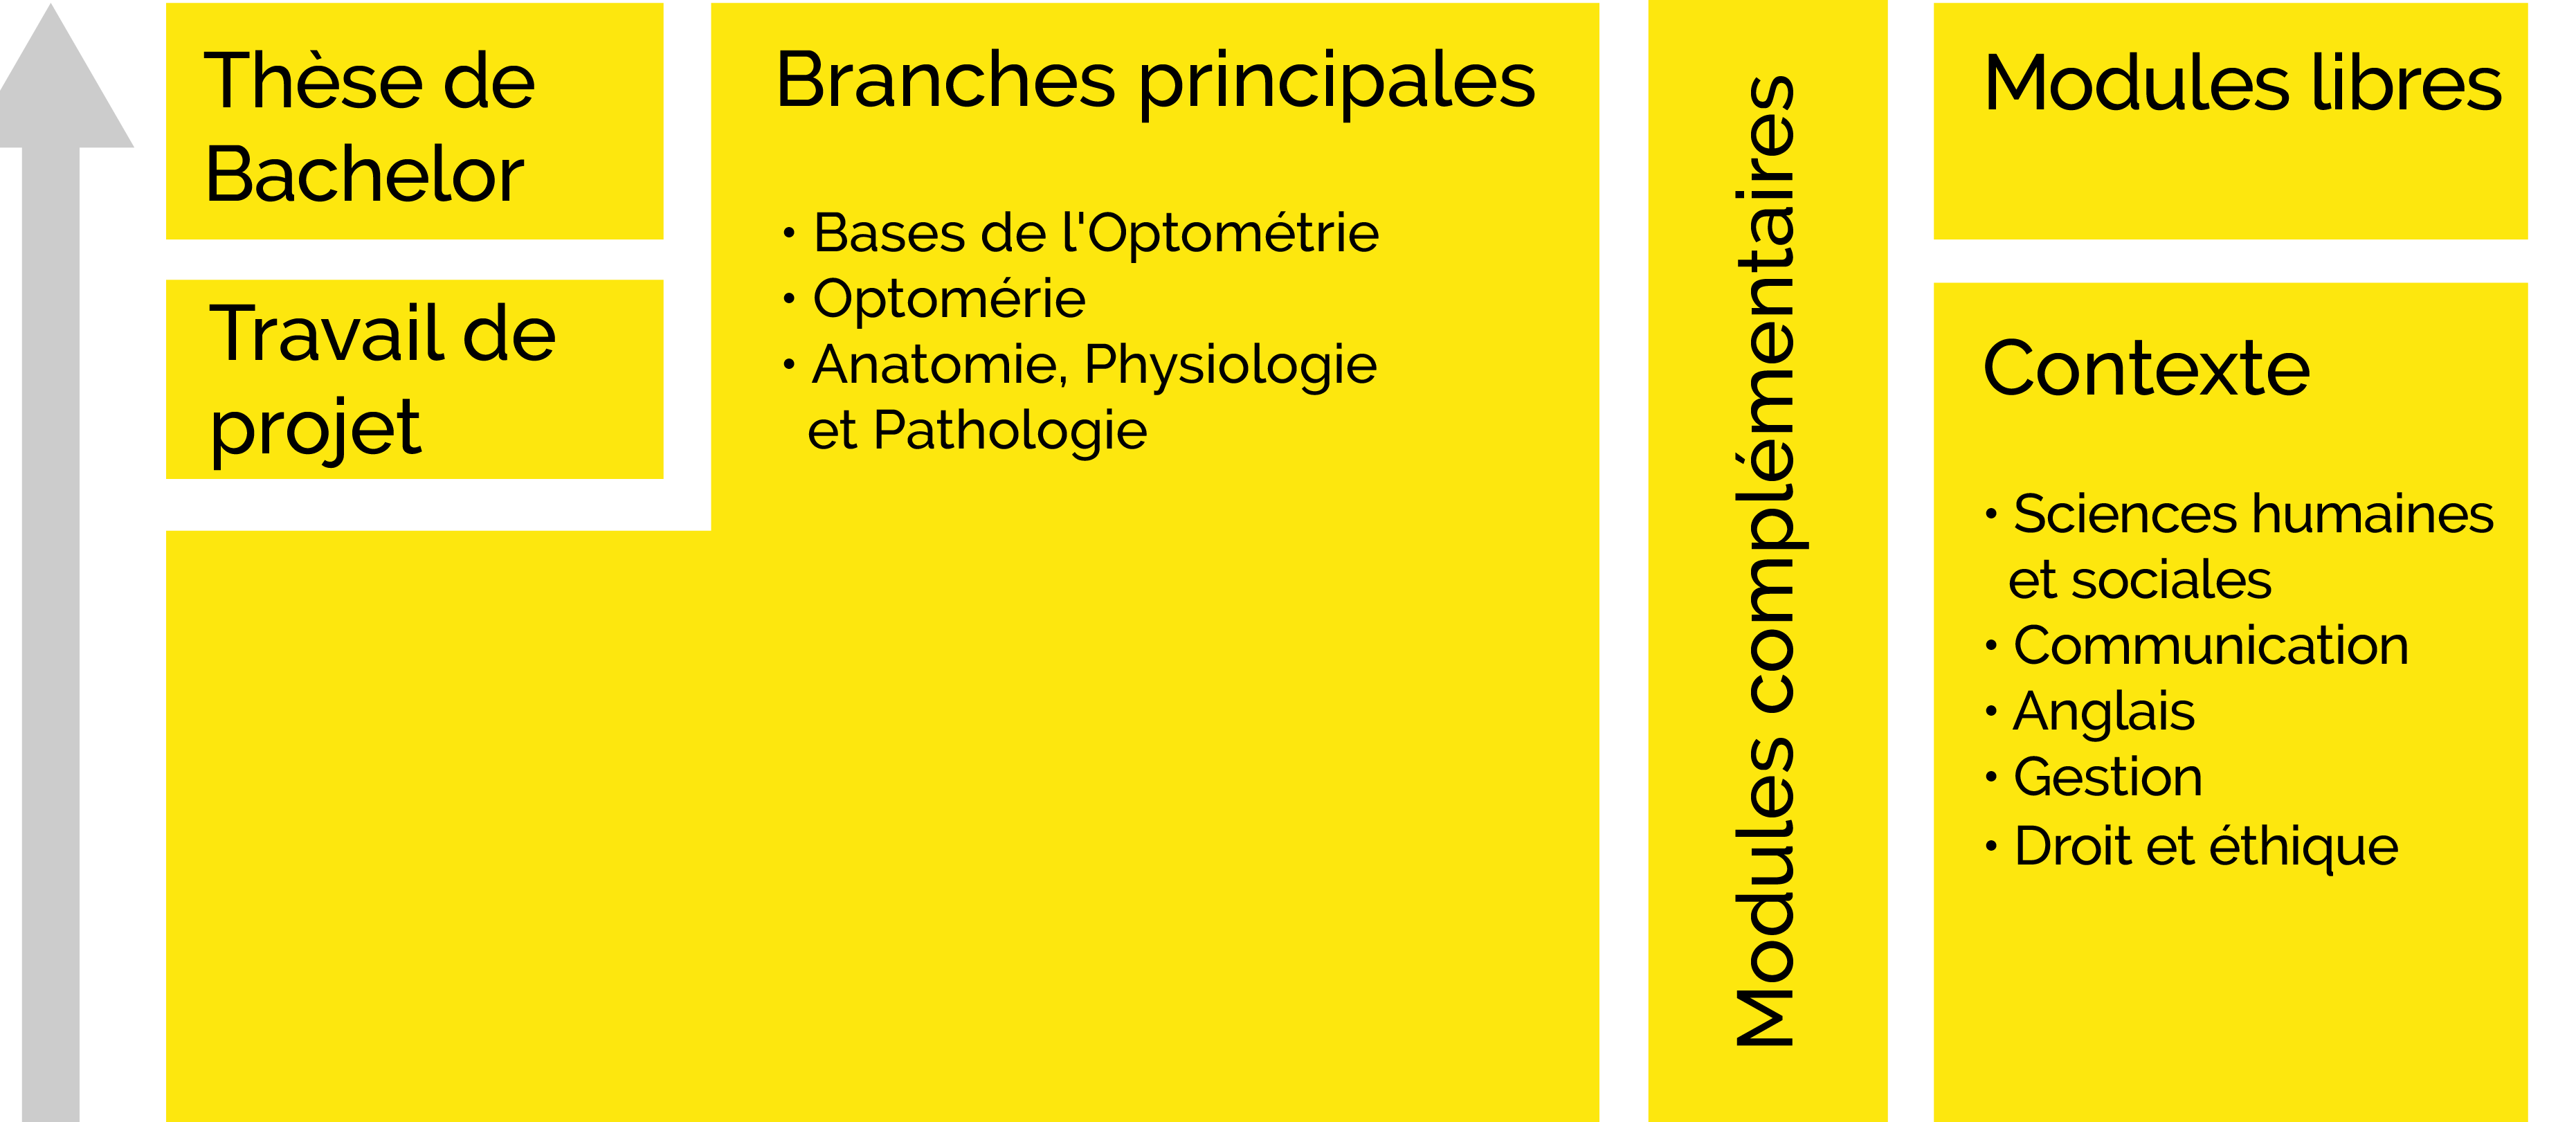 studiumaufbau-BSc-optometrie-ht-fhnw-fr.pdf